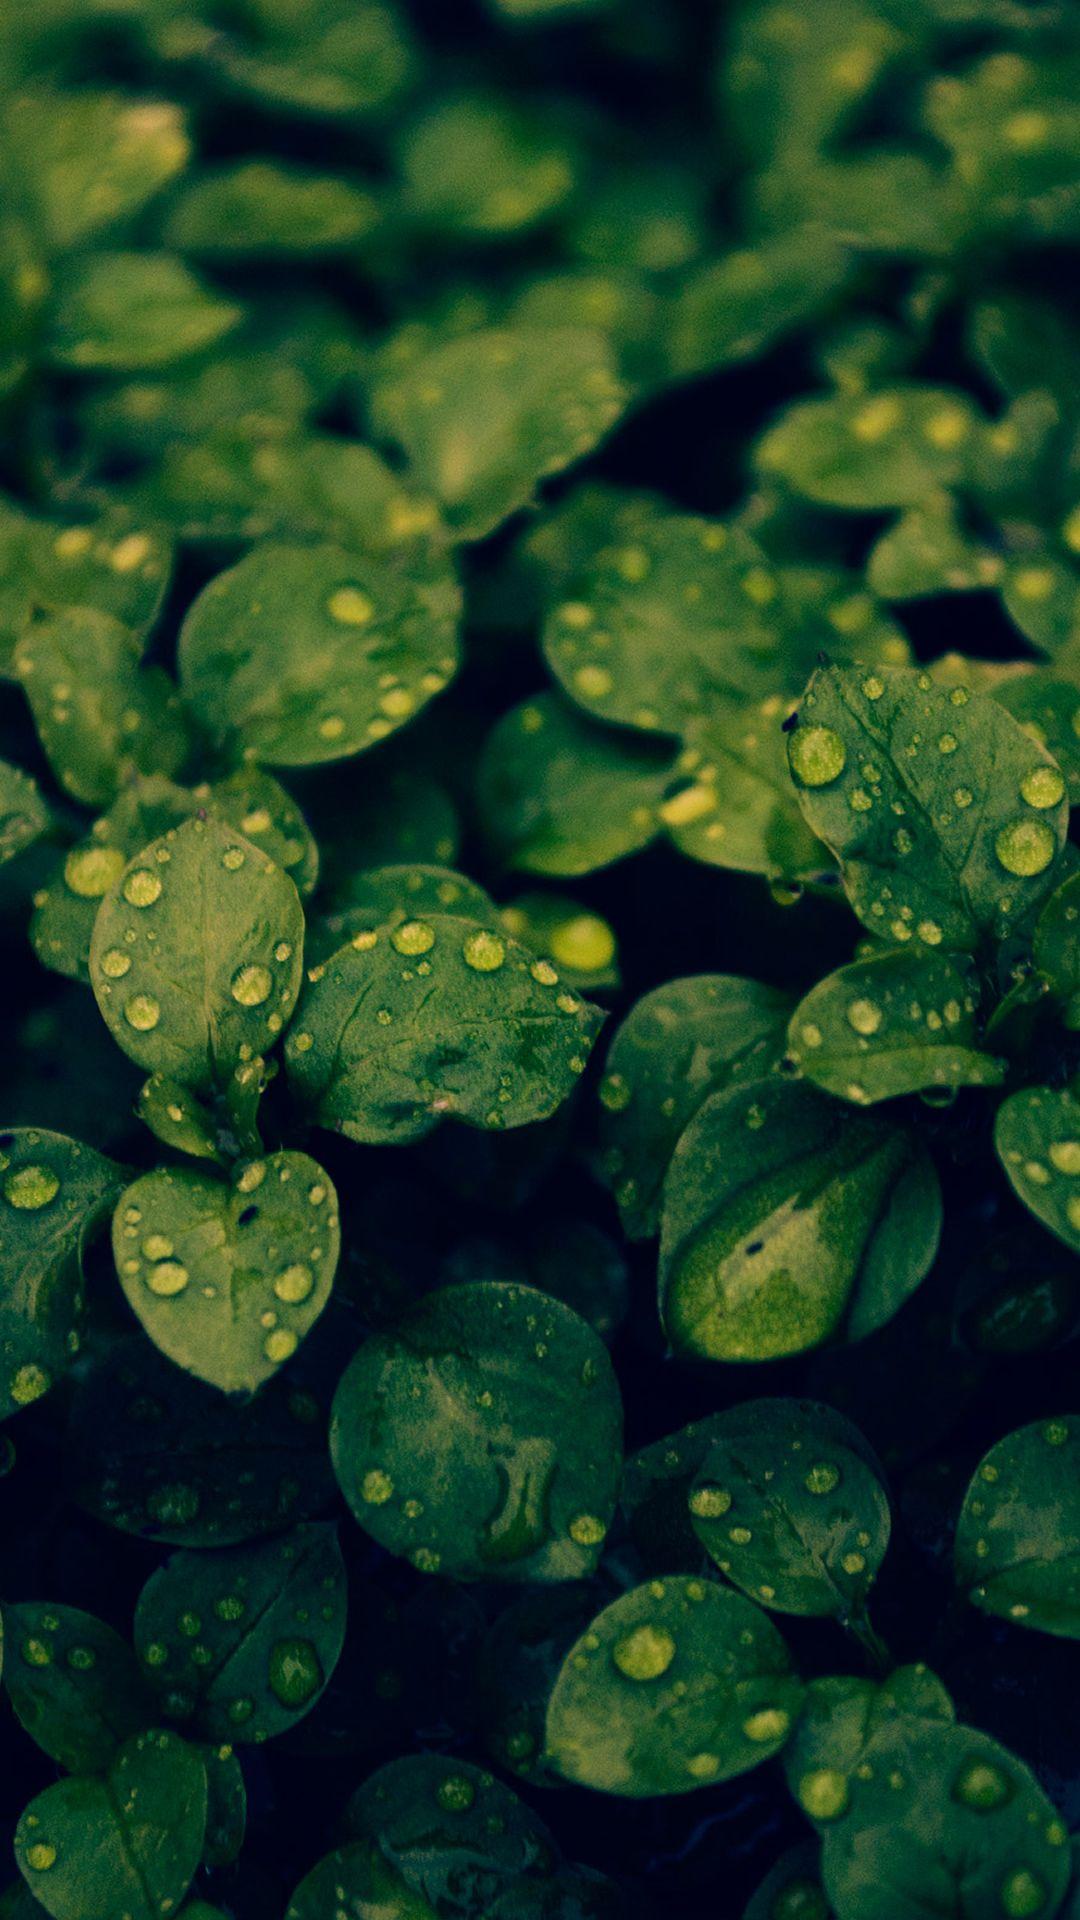 Fresh Dew Green Leafy Branch iPhone 6 plus wallpaper iPhone 1080x1920